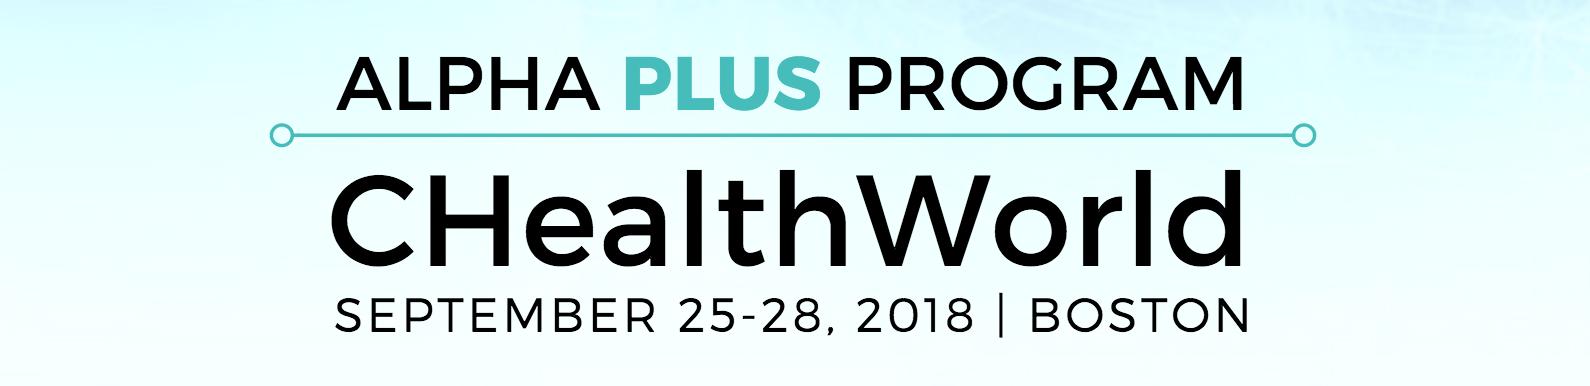 Alpha Plus Program at CHealthWorld